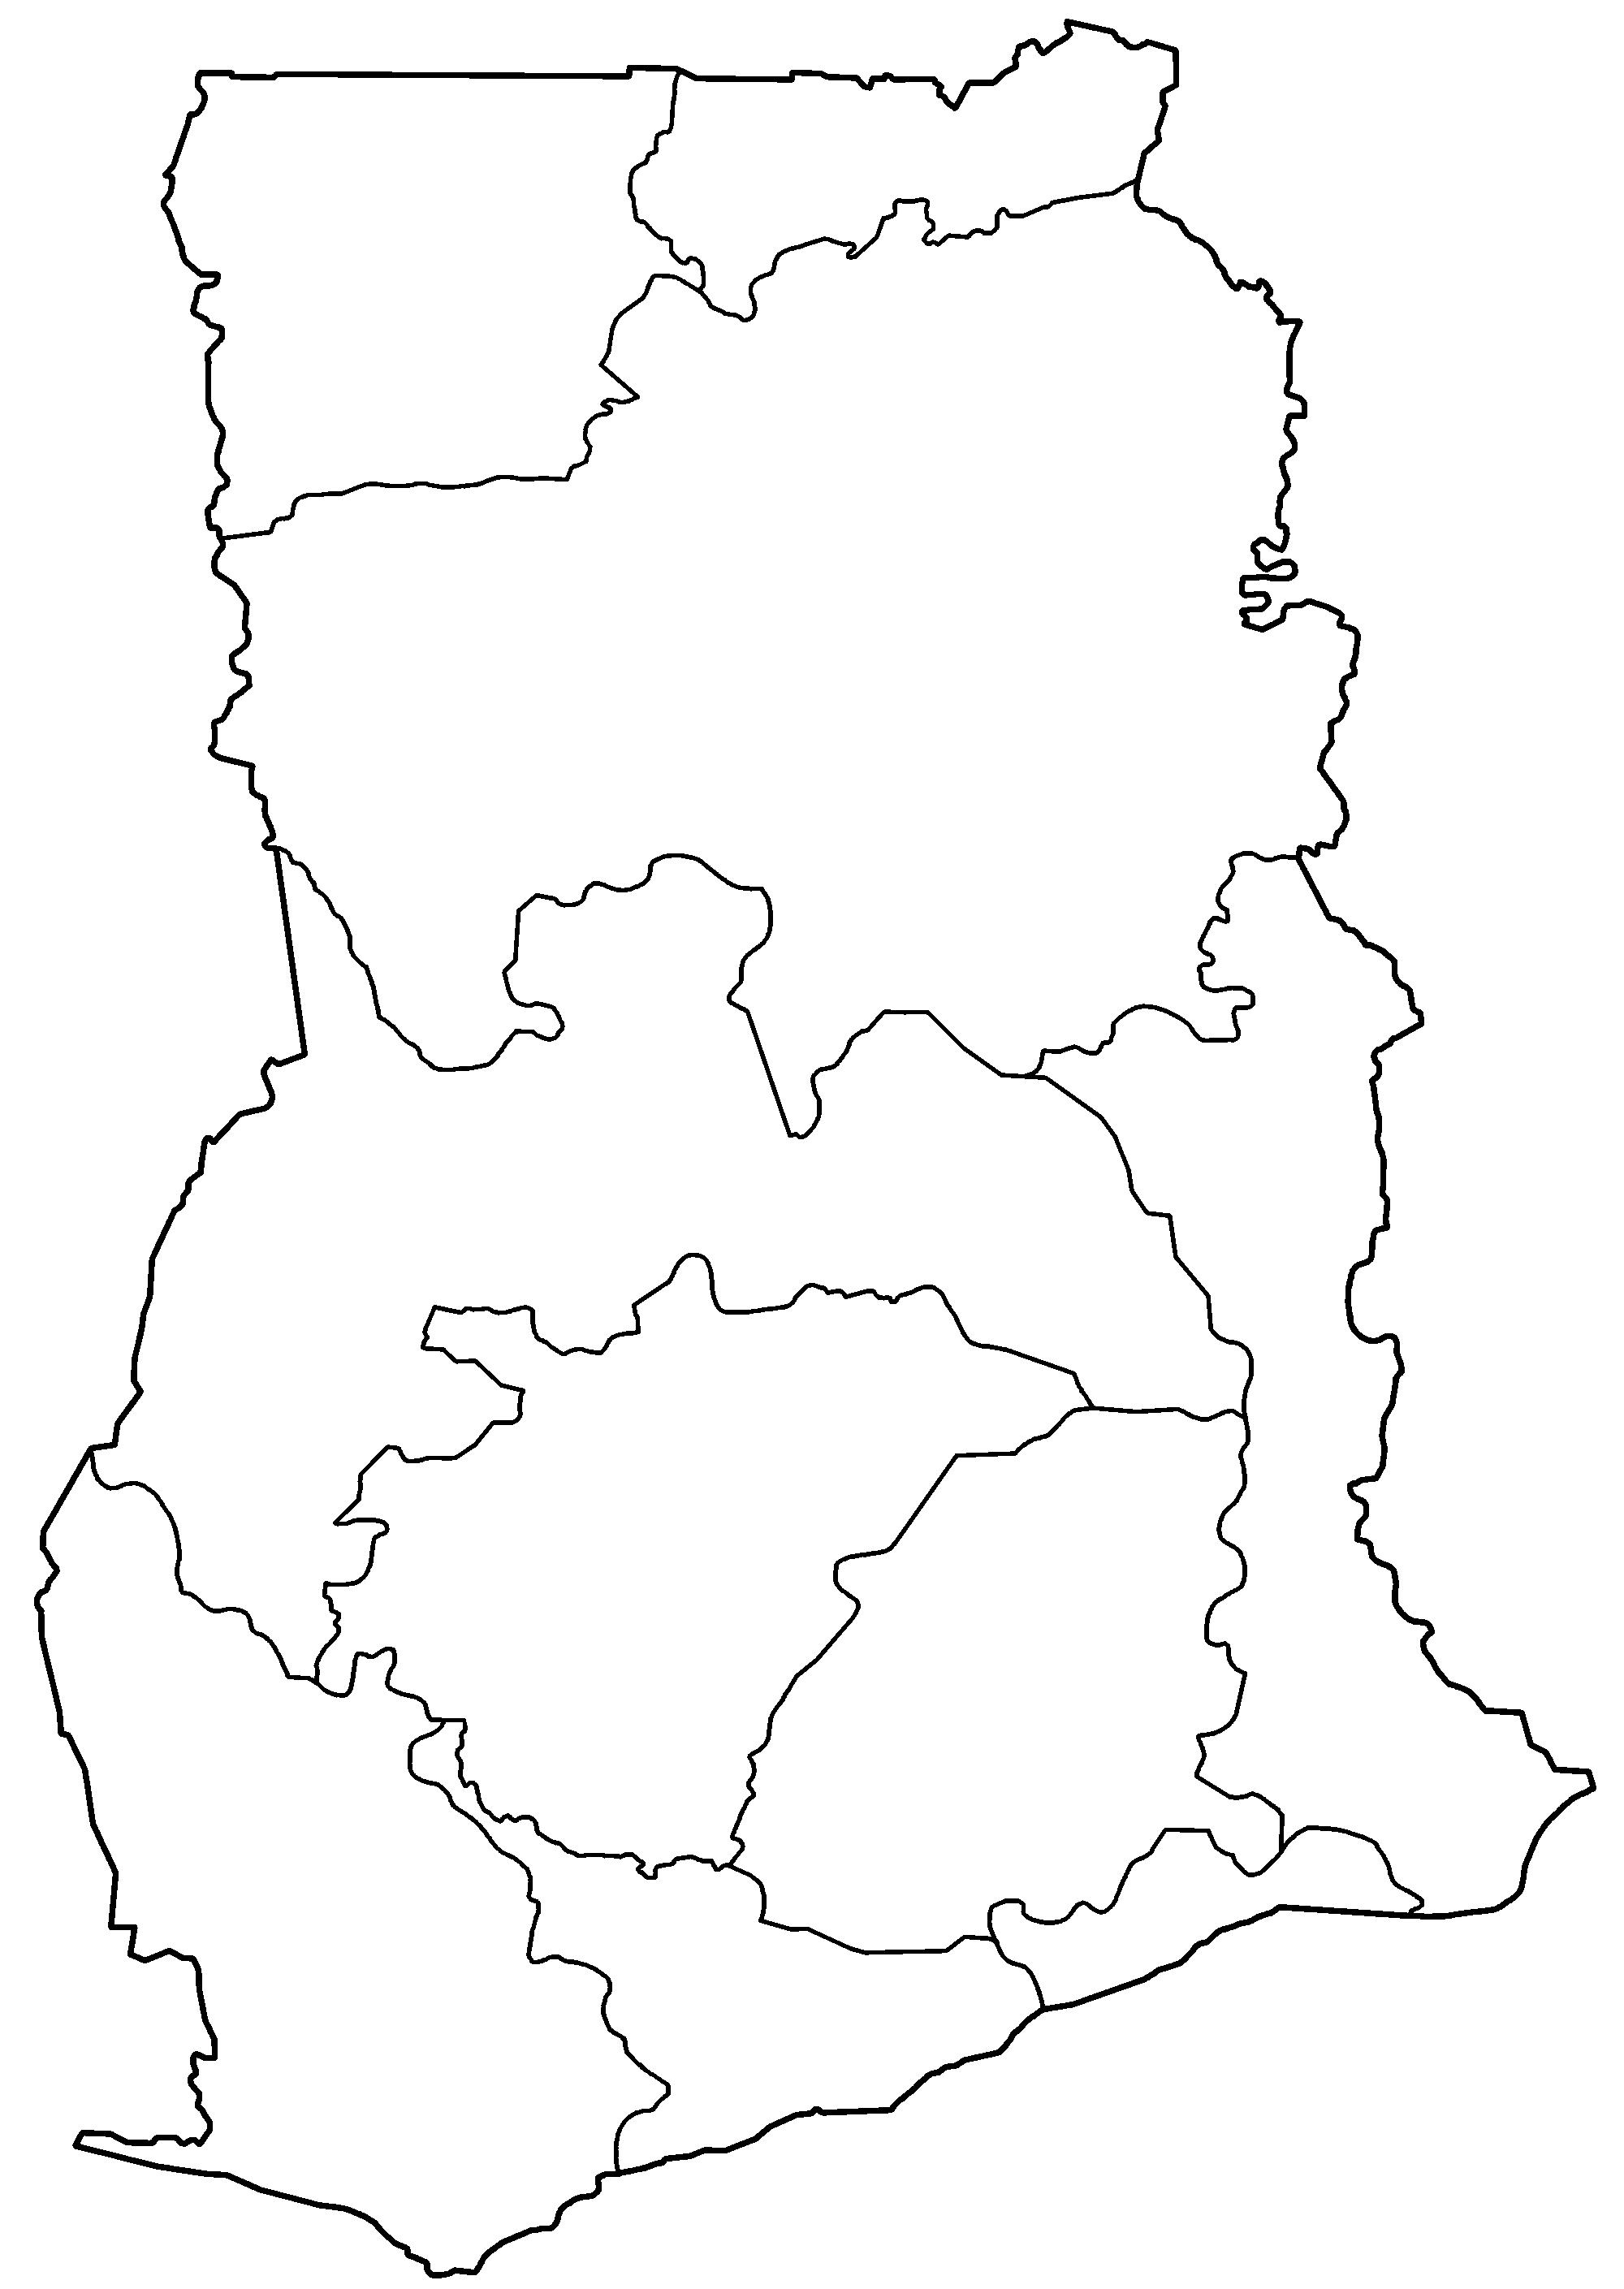 Ghana Map Blank - Ghana map